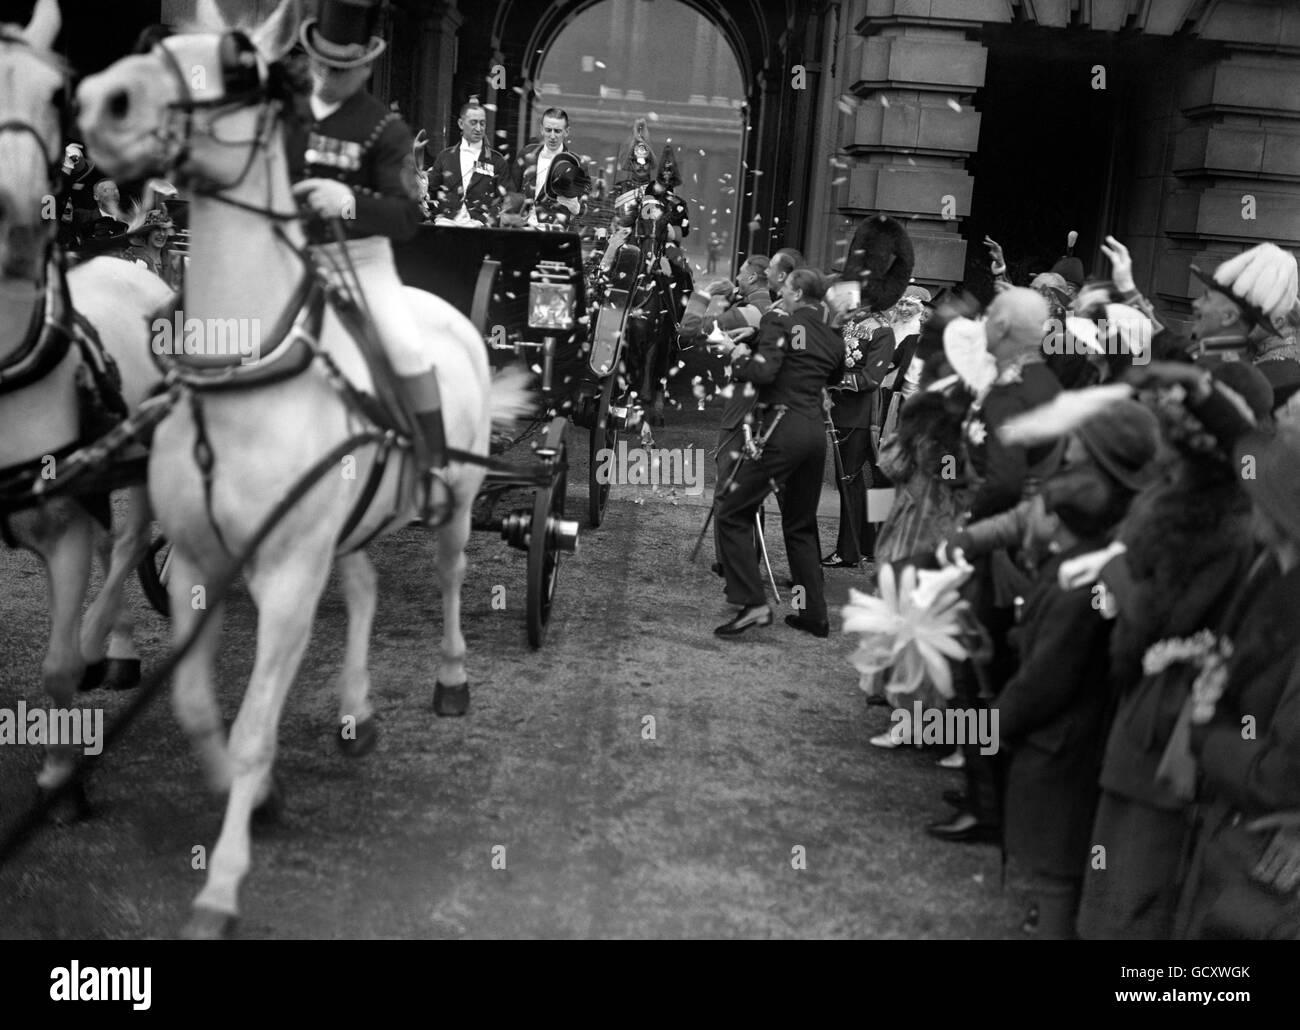 Royalty - Princess Mary and Viscount Lascelles Wedding - London - Stock Image